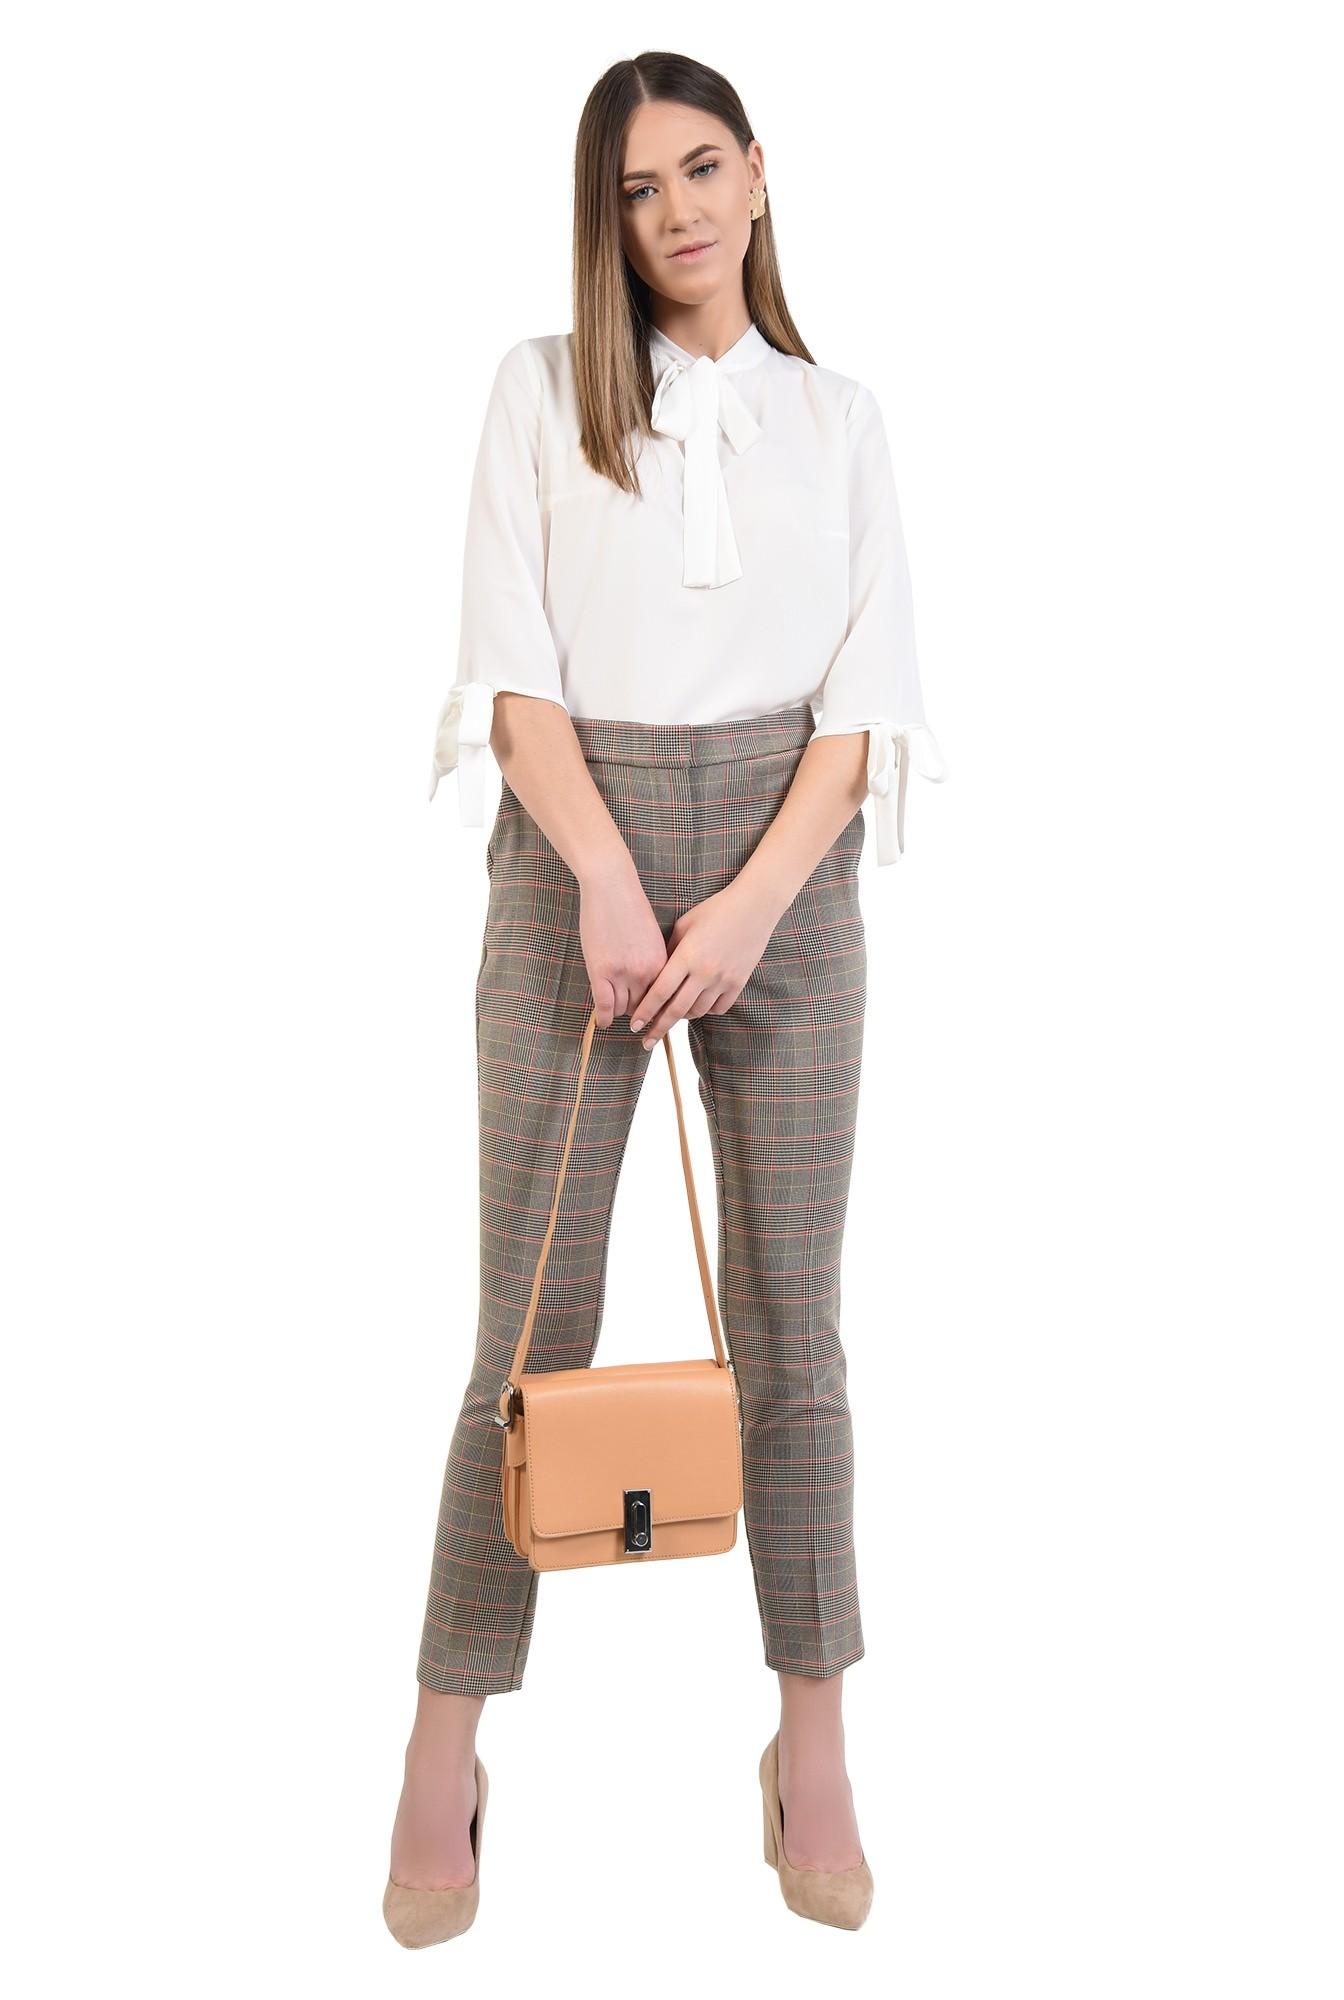 360 - pantaloni de costum, in carouri, conici, buzunare in cusatura